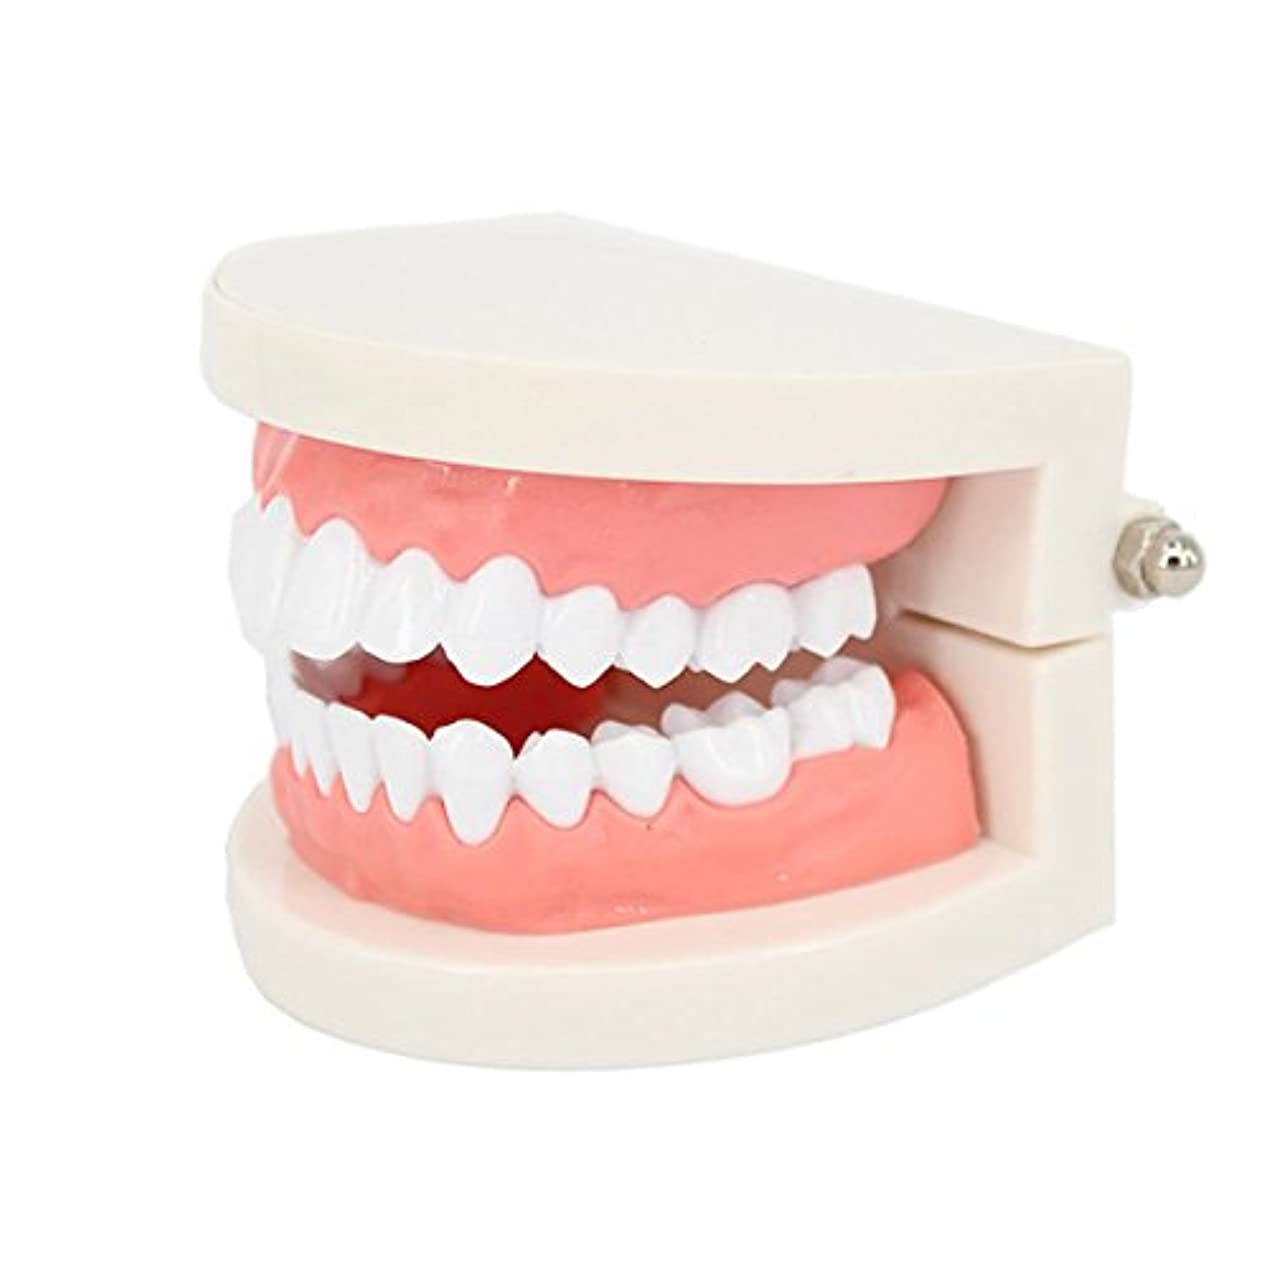 重要滑り台なぜROSENICE 歯科医 歯列模型 歯は着脱可能 指導用模型